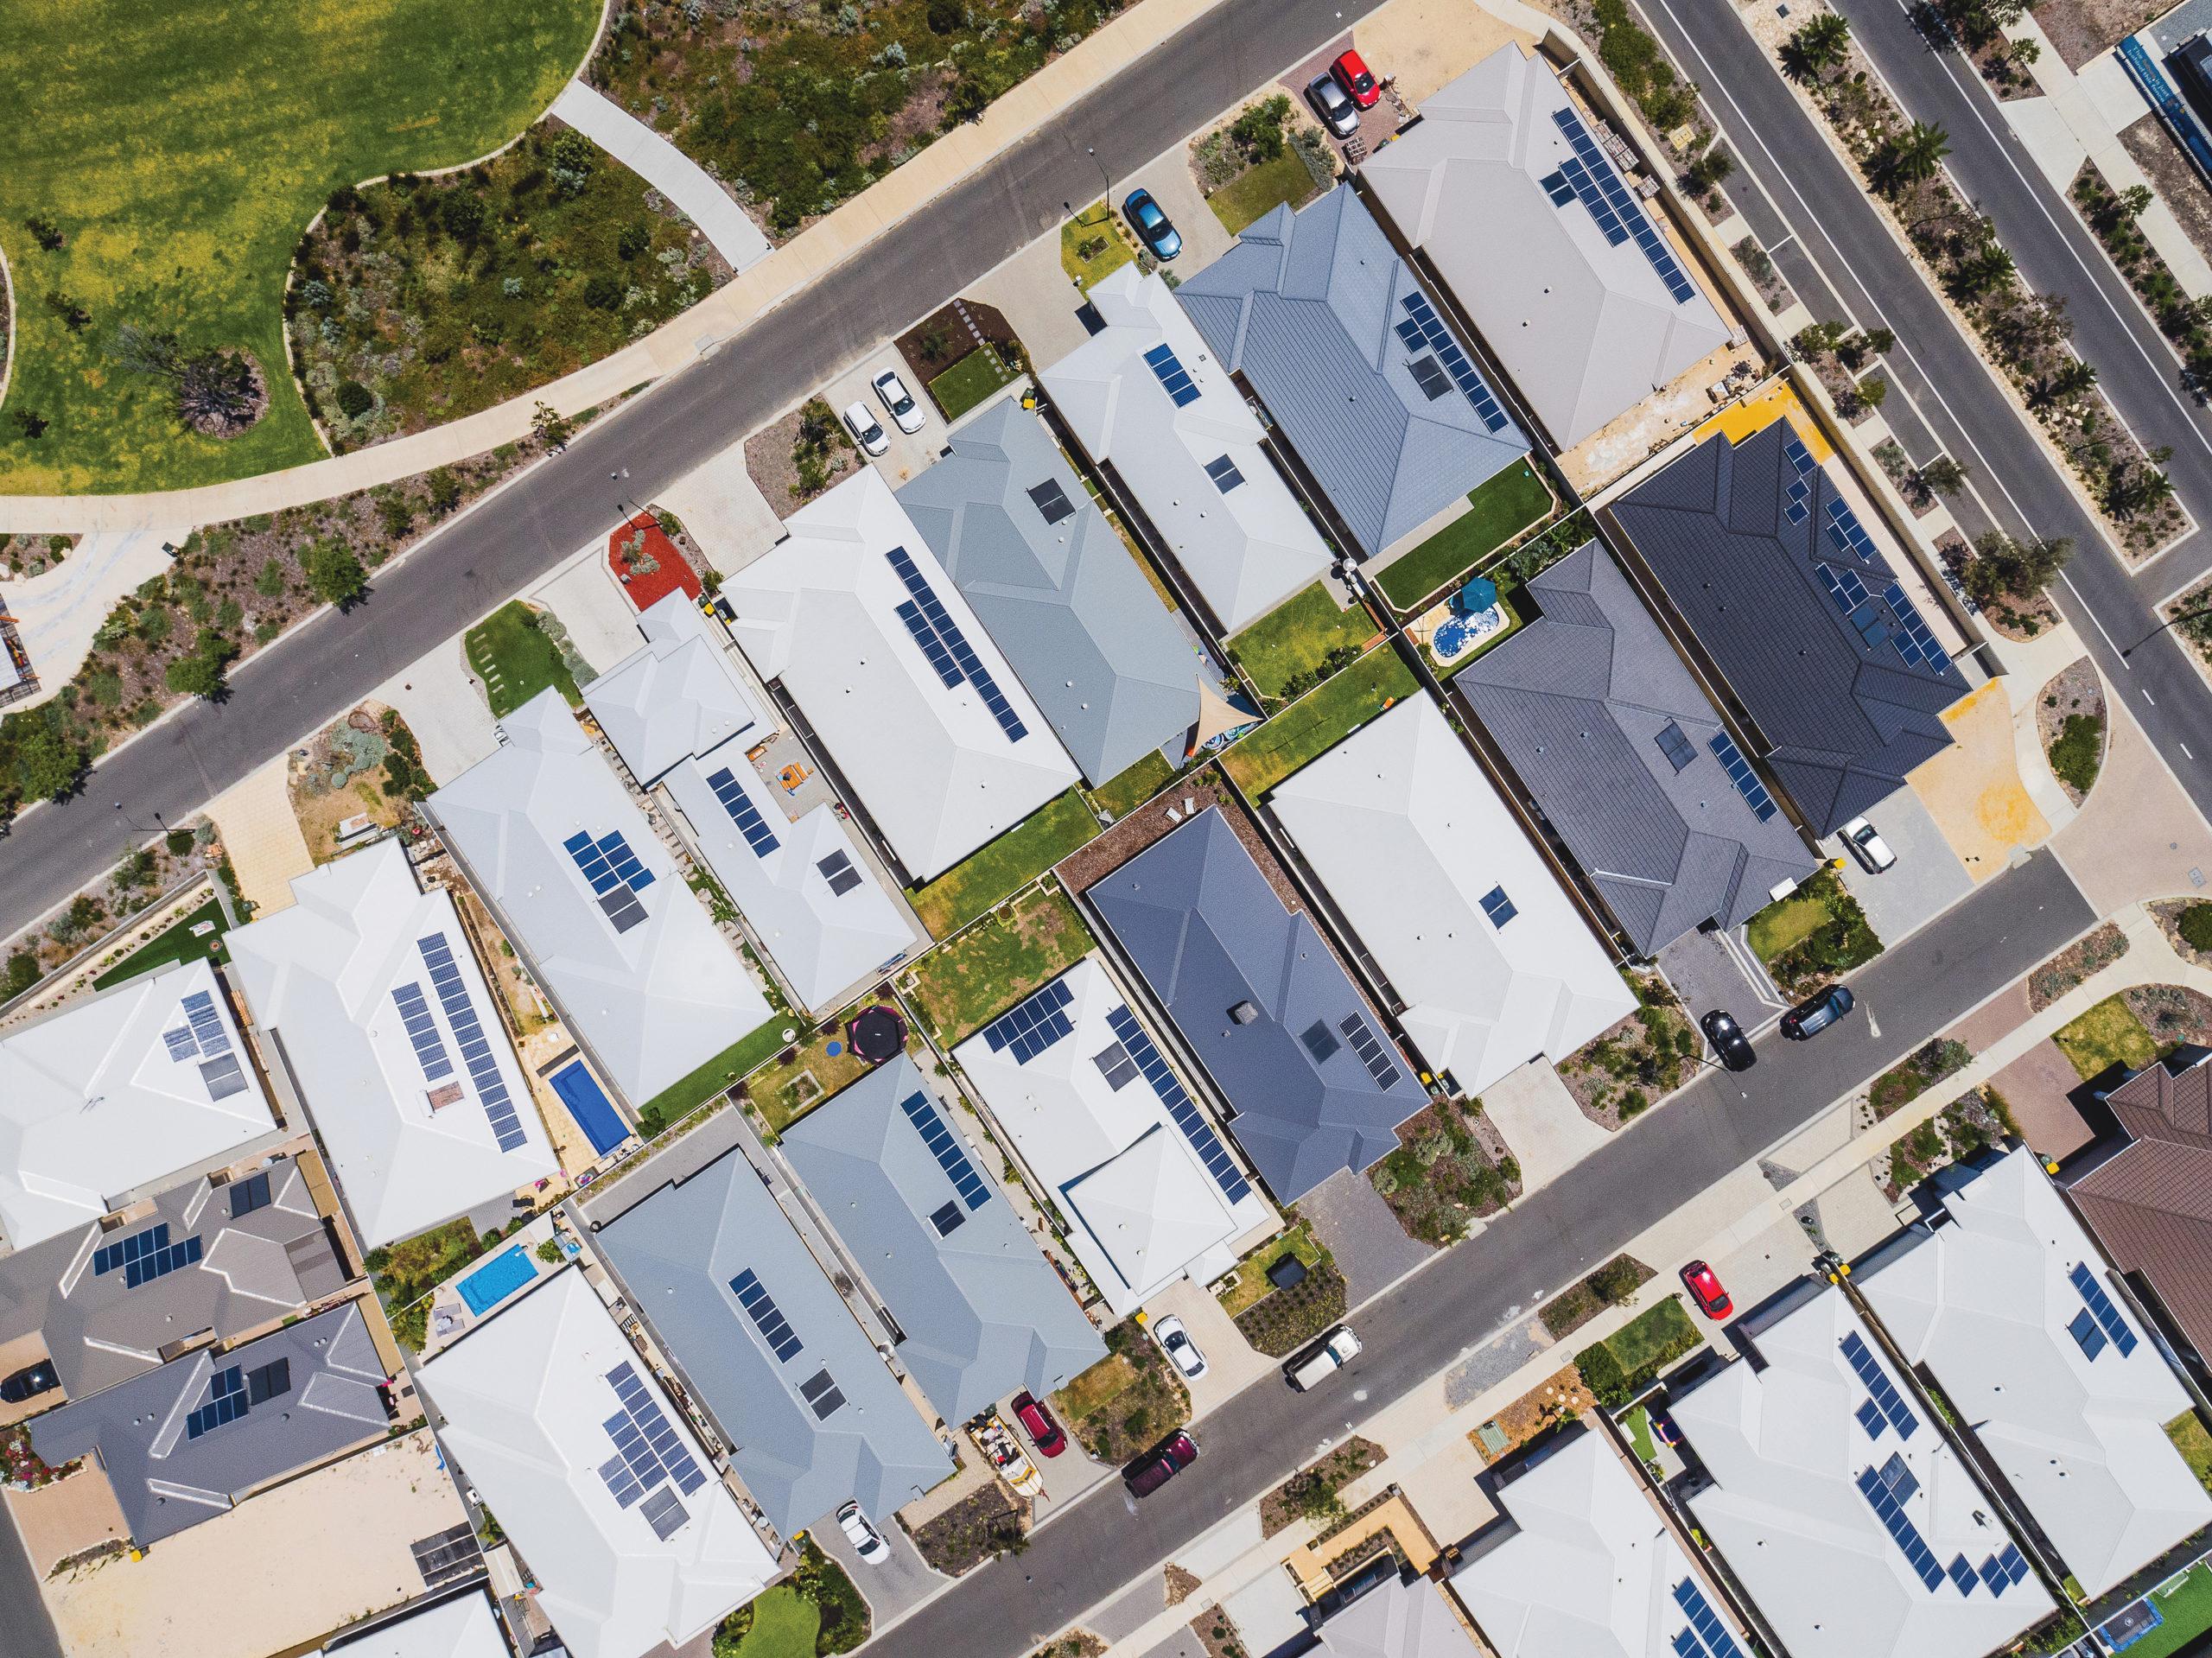 Birds eye view of a suburban location